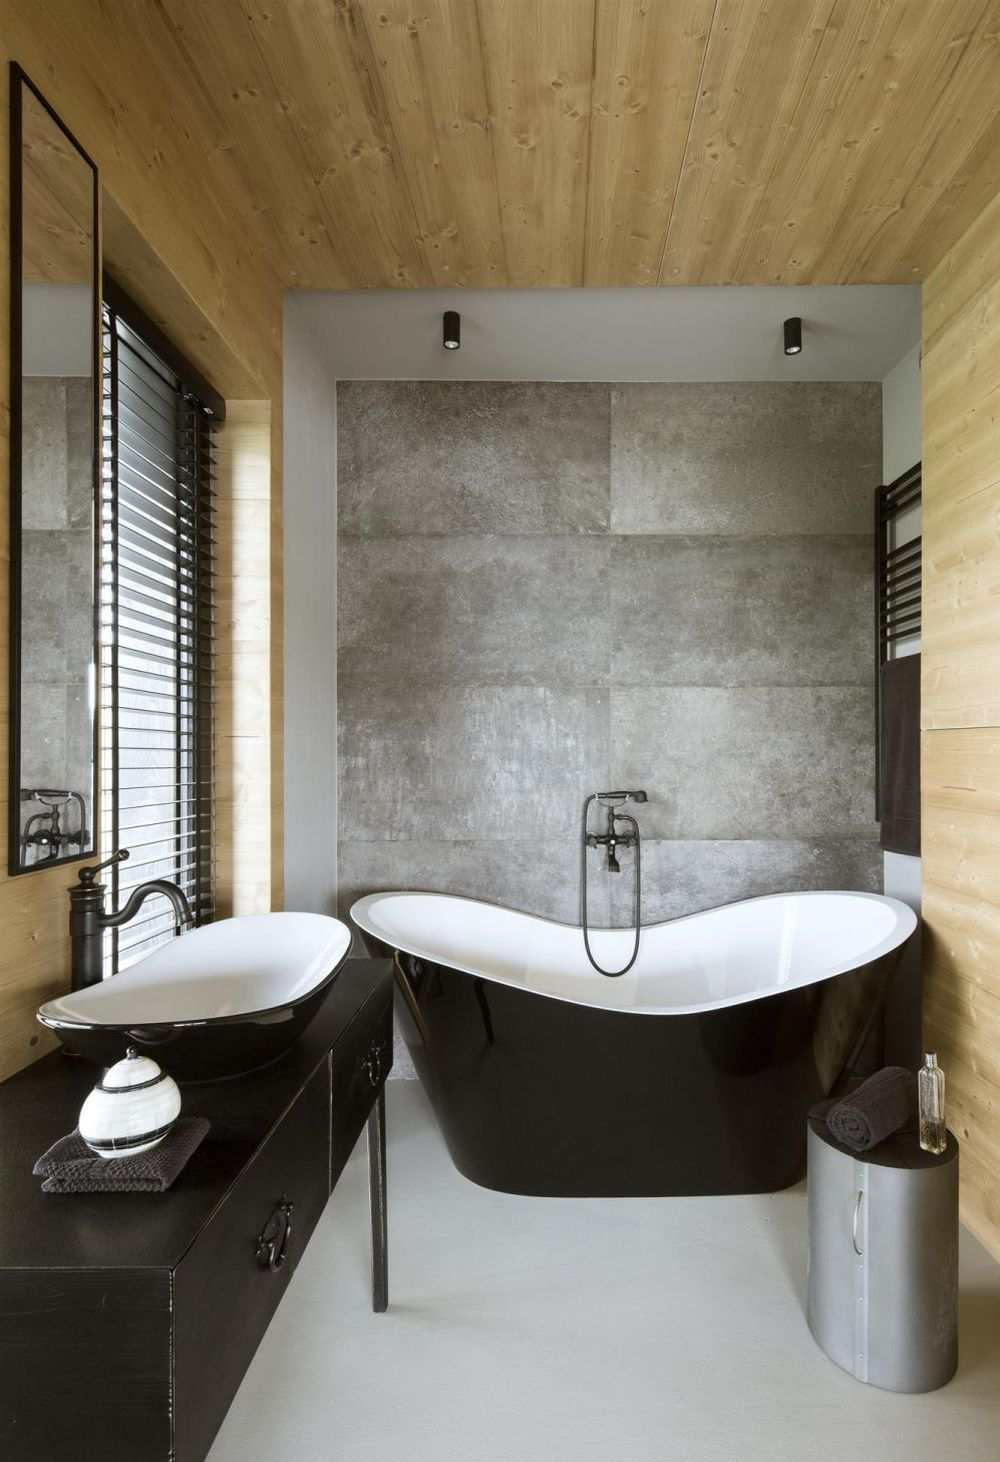 adelaparvu.com despre casa contemporana inspirata de arhitectura traditionala, Design Hola Design Studio, arhitectura Exterior, Foto Yassen Hristov (6)